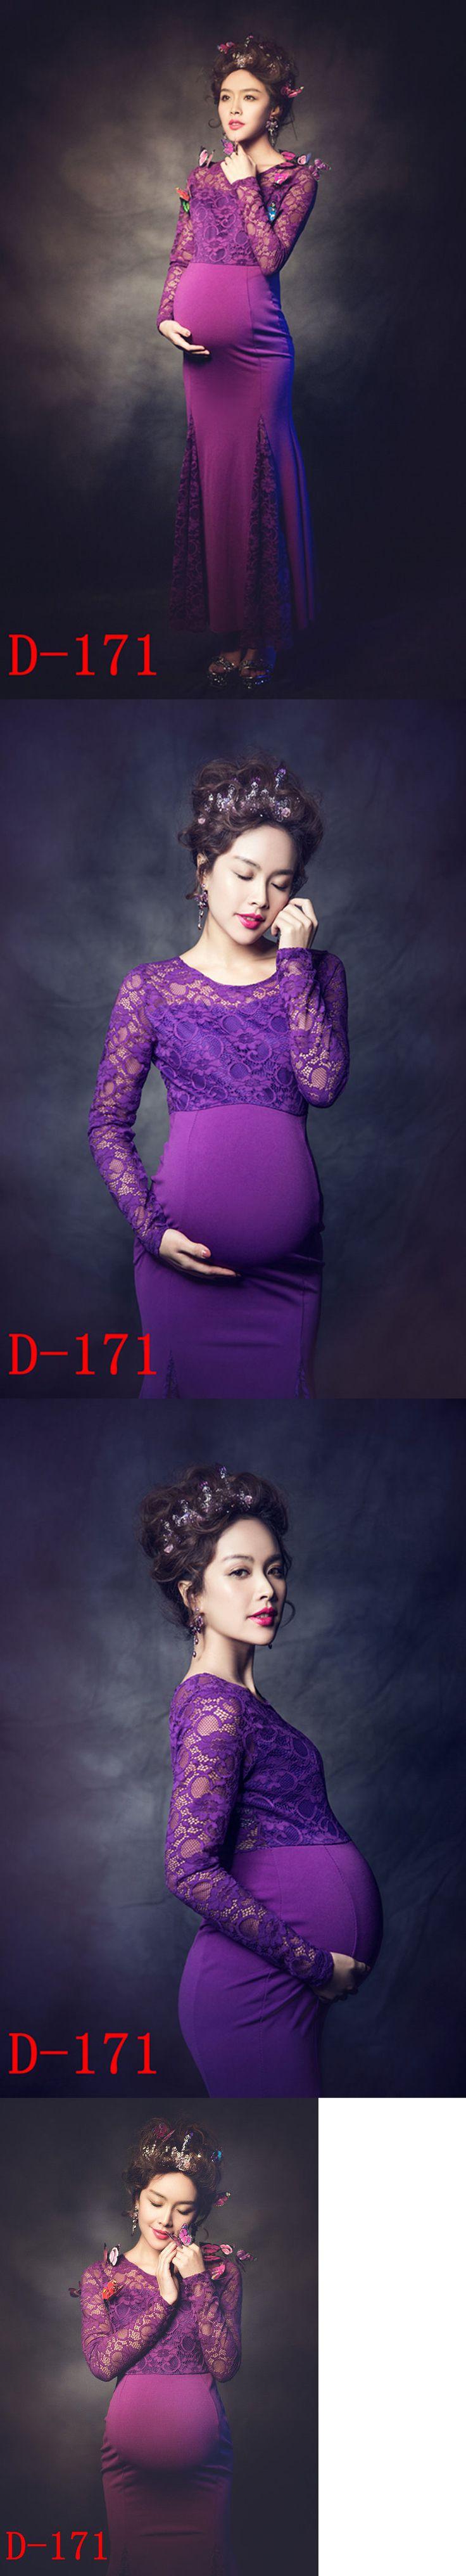 261 mejores imágenes de Pregnancy dress en Pinterest   Embarazo ...